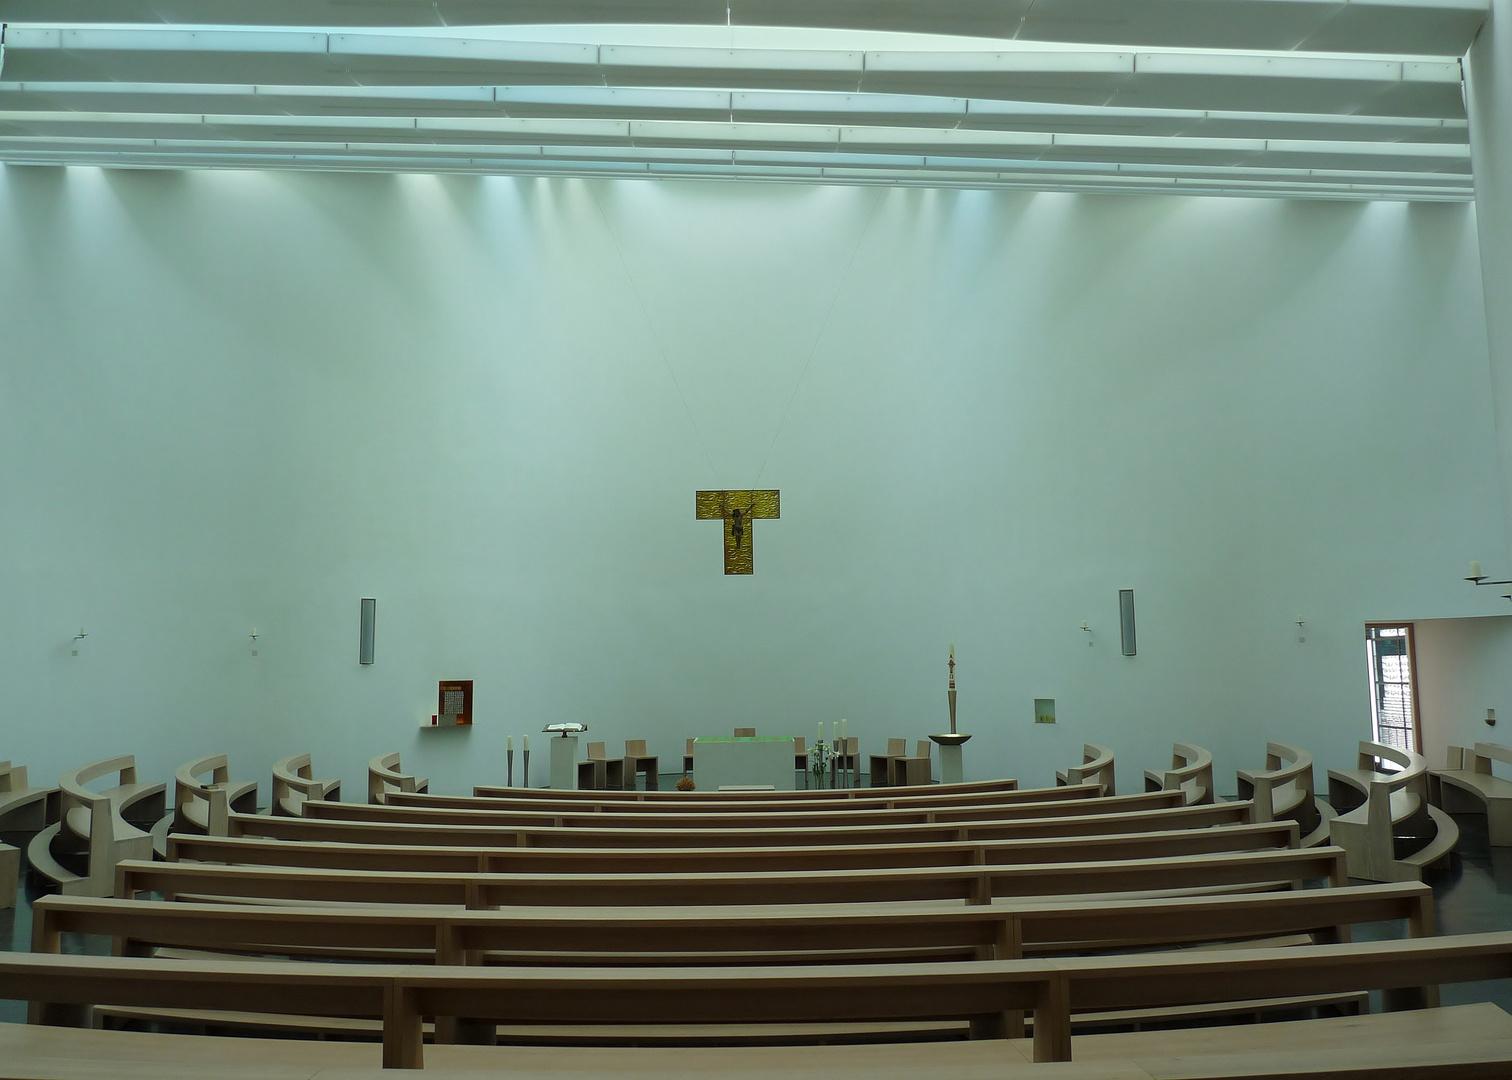 Kath. Kirche St.Marien, Schillig, Friesland